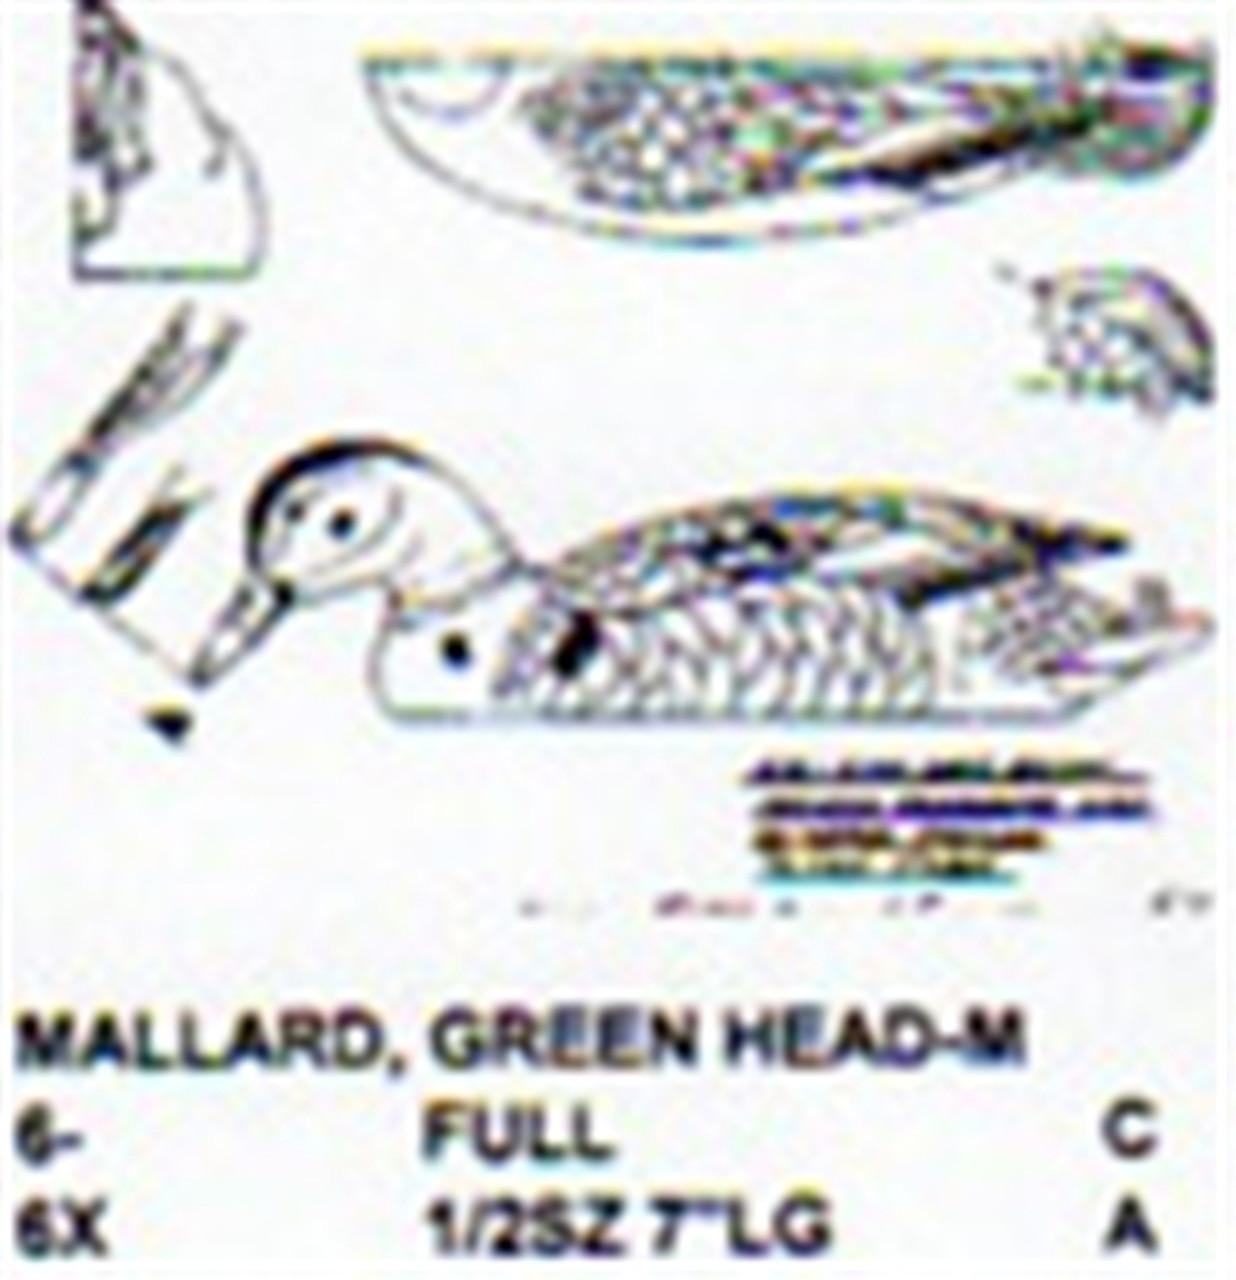 Green Head Mallard Male Resting On Water/Feeding showing the full size plan.